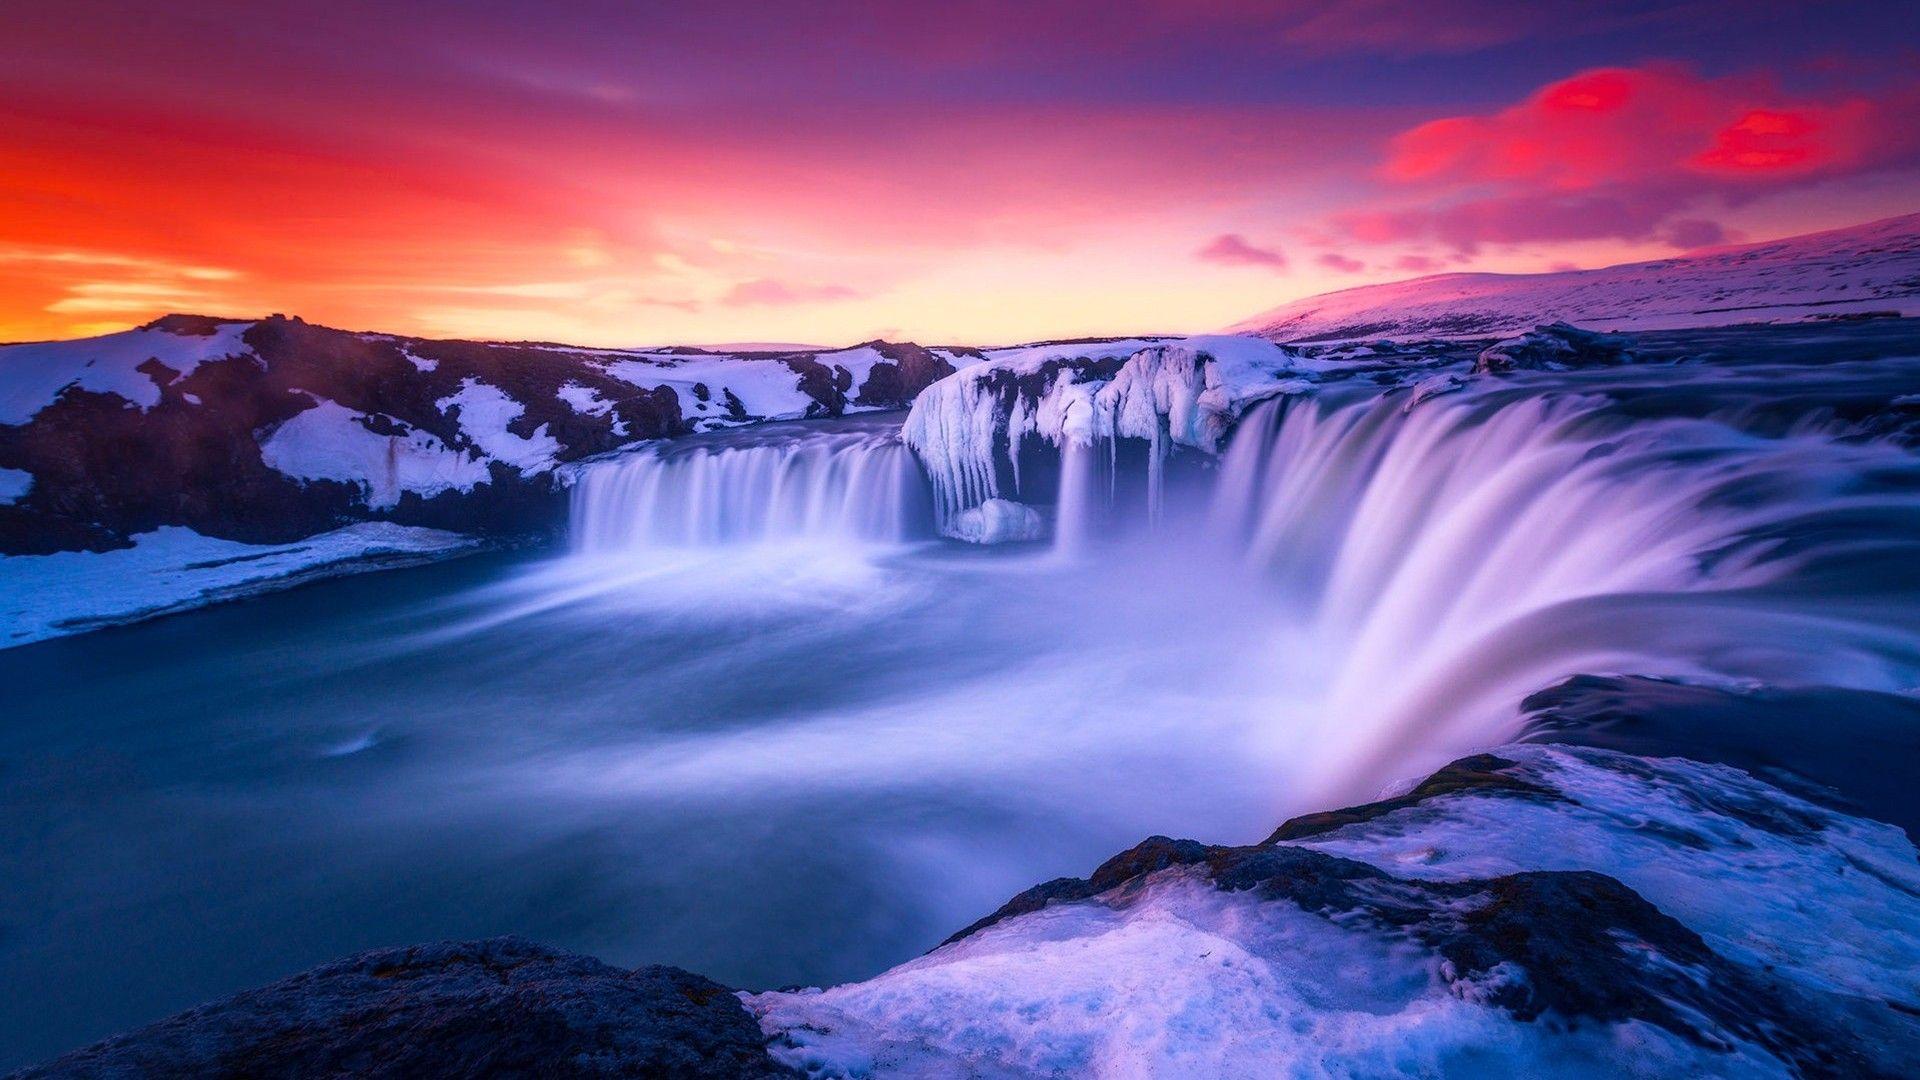 Waterfall Iceland Laptop Full Hd 1080p Hd 4k Wallpapers Waterfall Wallpaper Huawei 1920x1080 Wallpaper Teahub Io